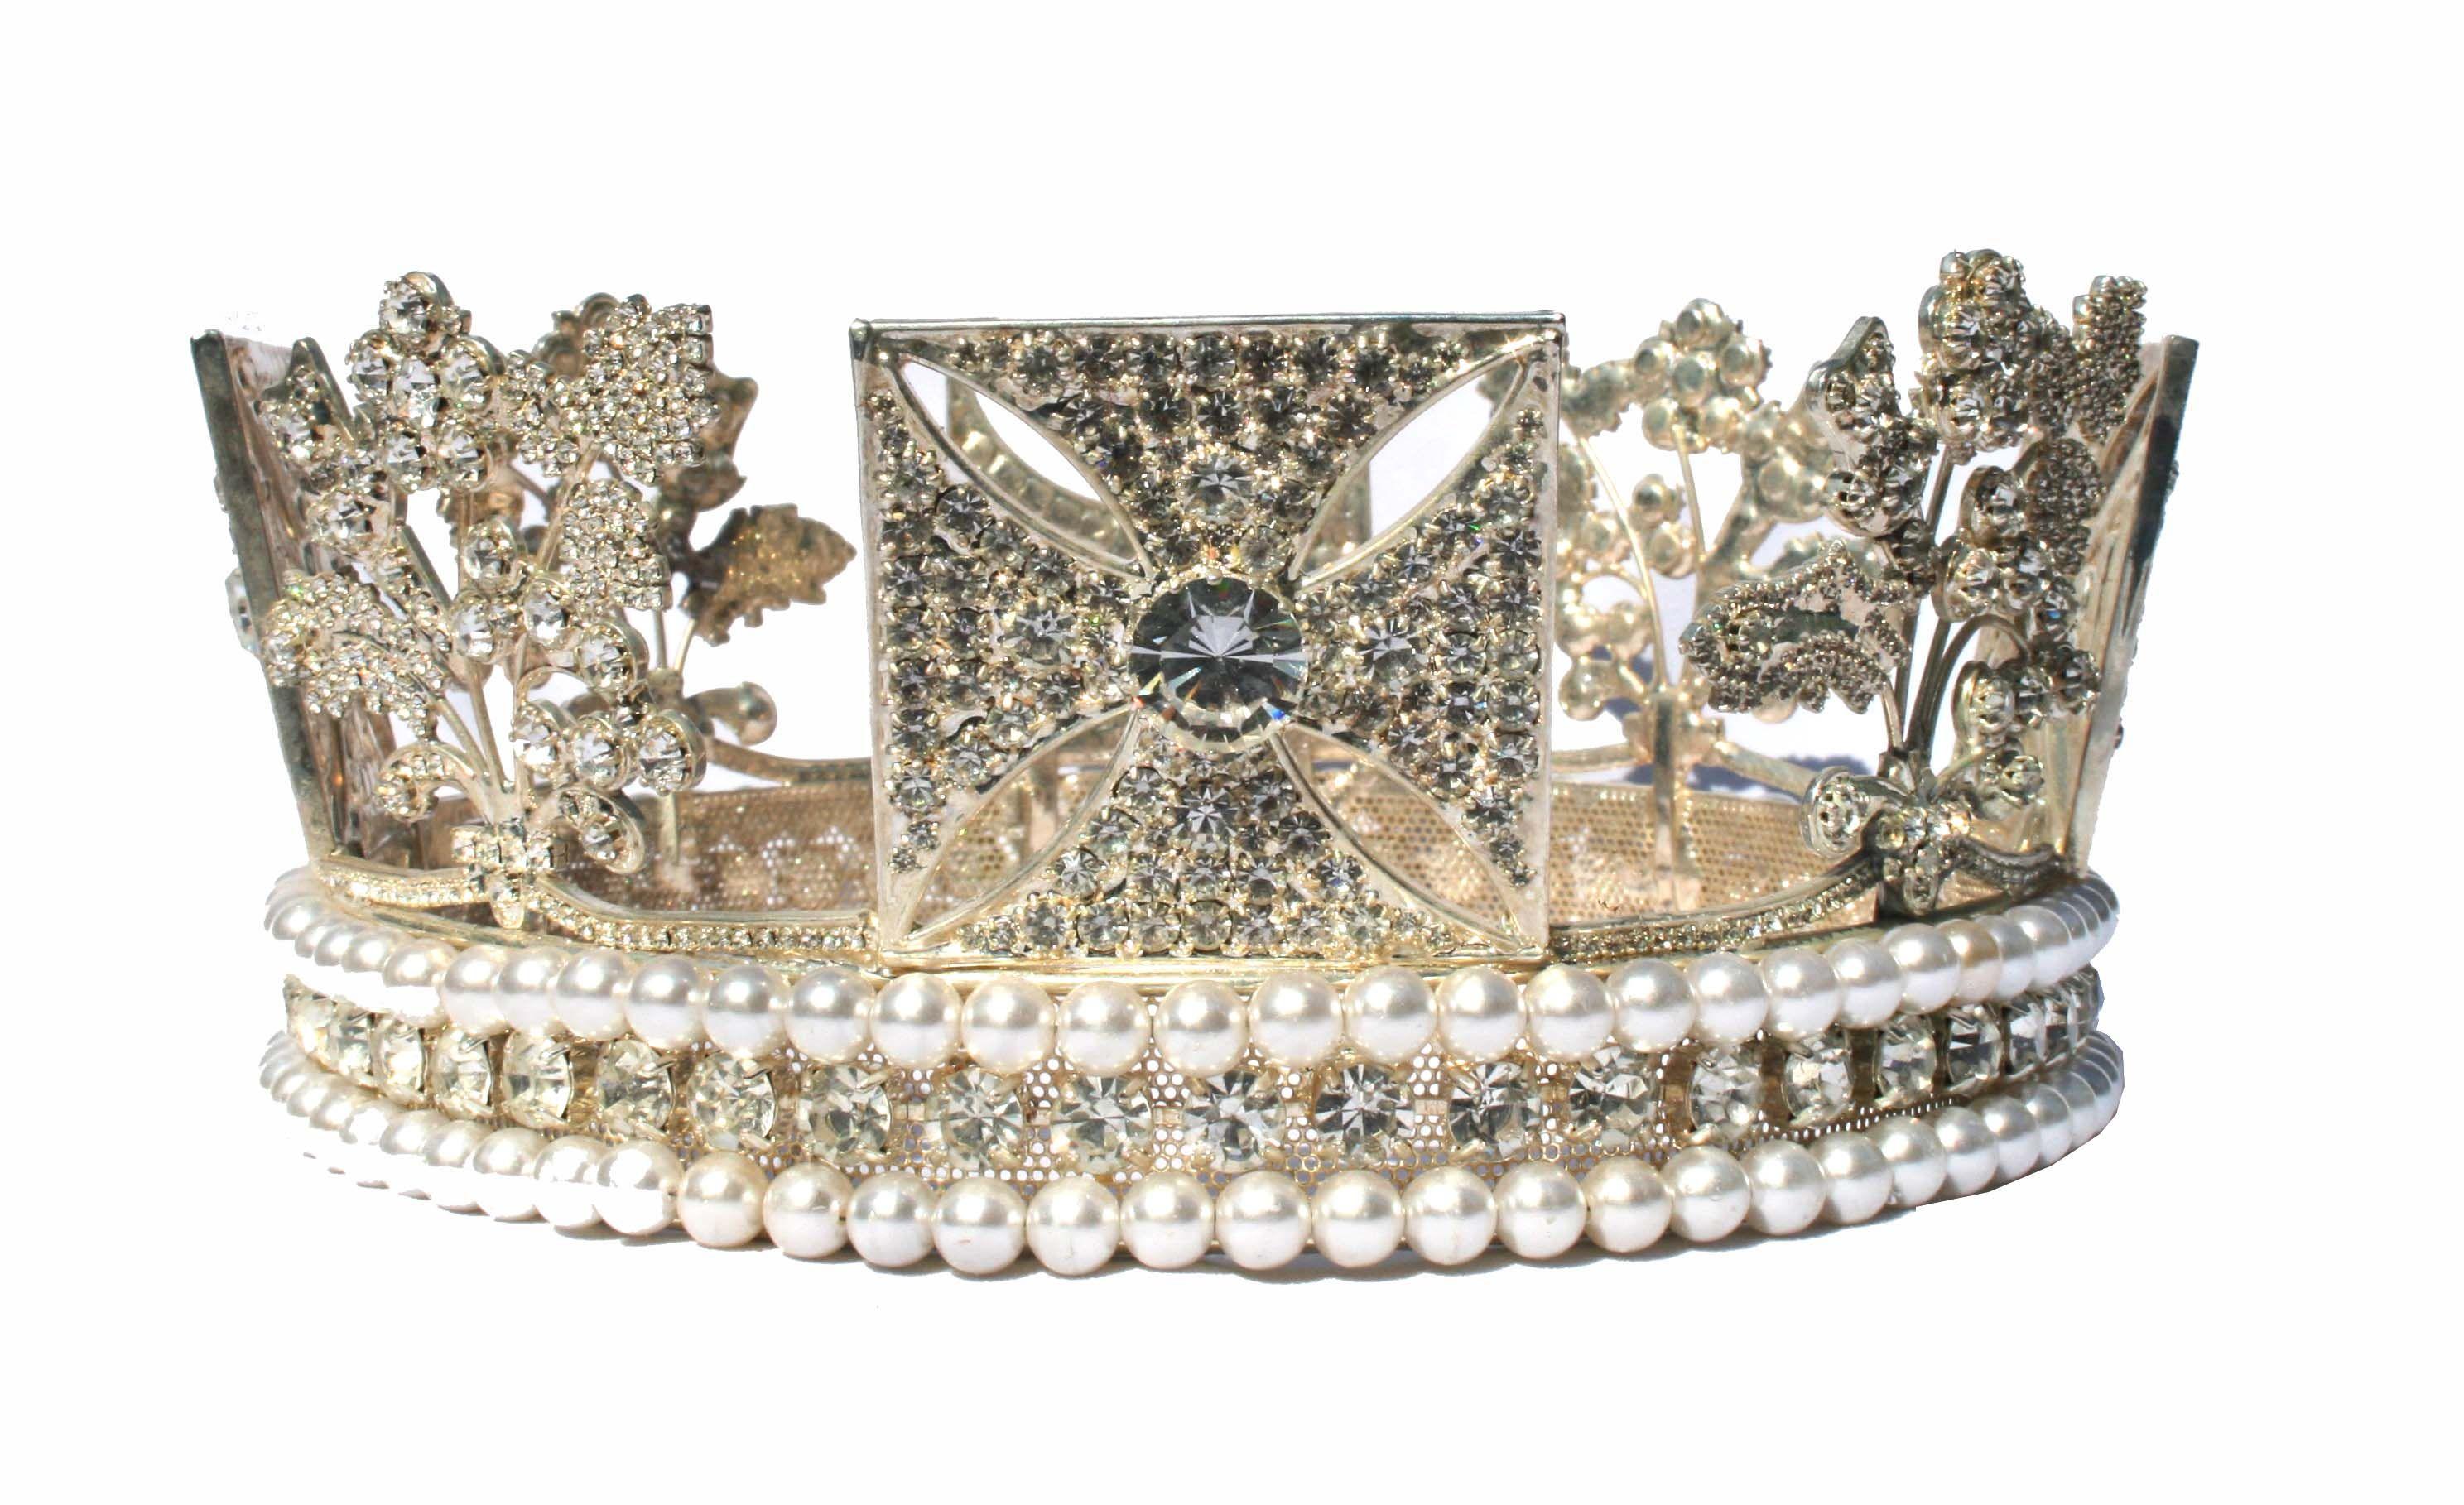 تيجان ملكية  امبراطورية فاخرة 1e6ae7705ab9e209b73482a25bb57ffa